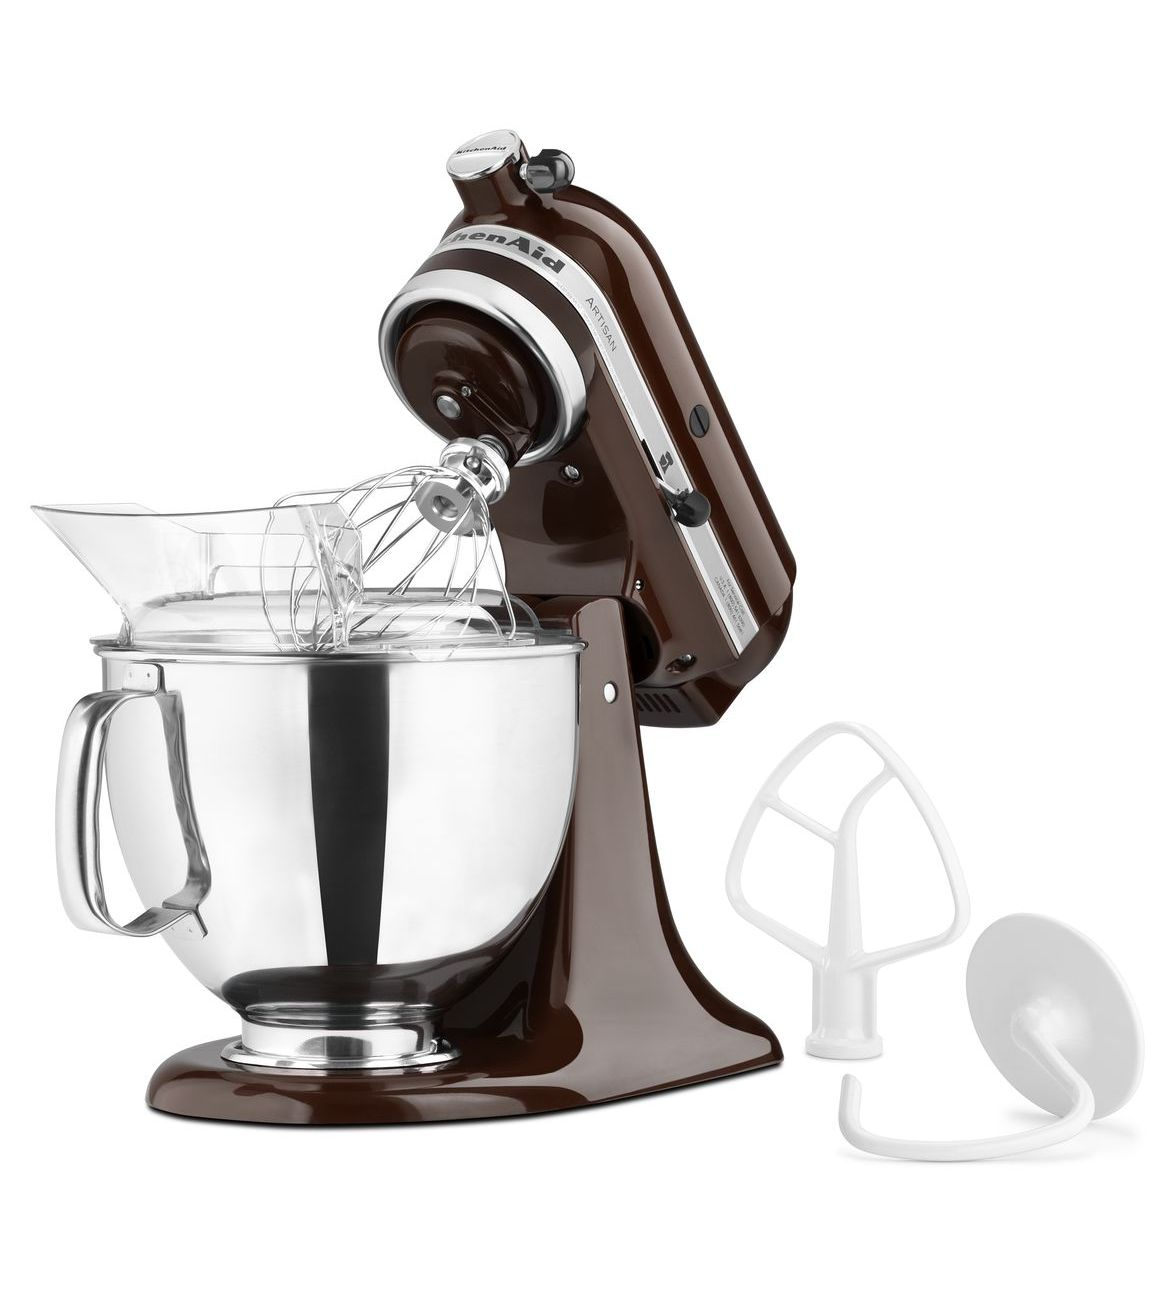 Kitchenaid stand mixer black friday photo - 3